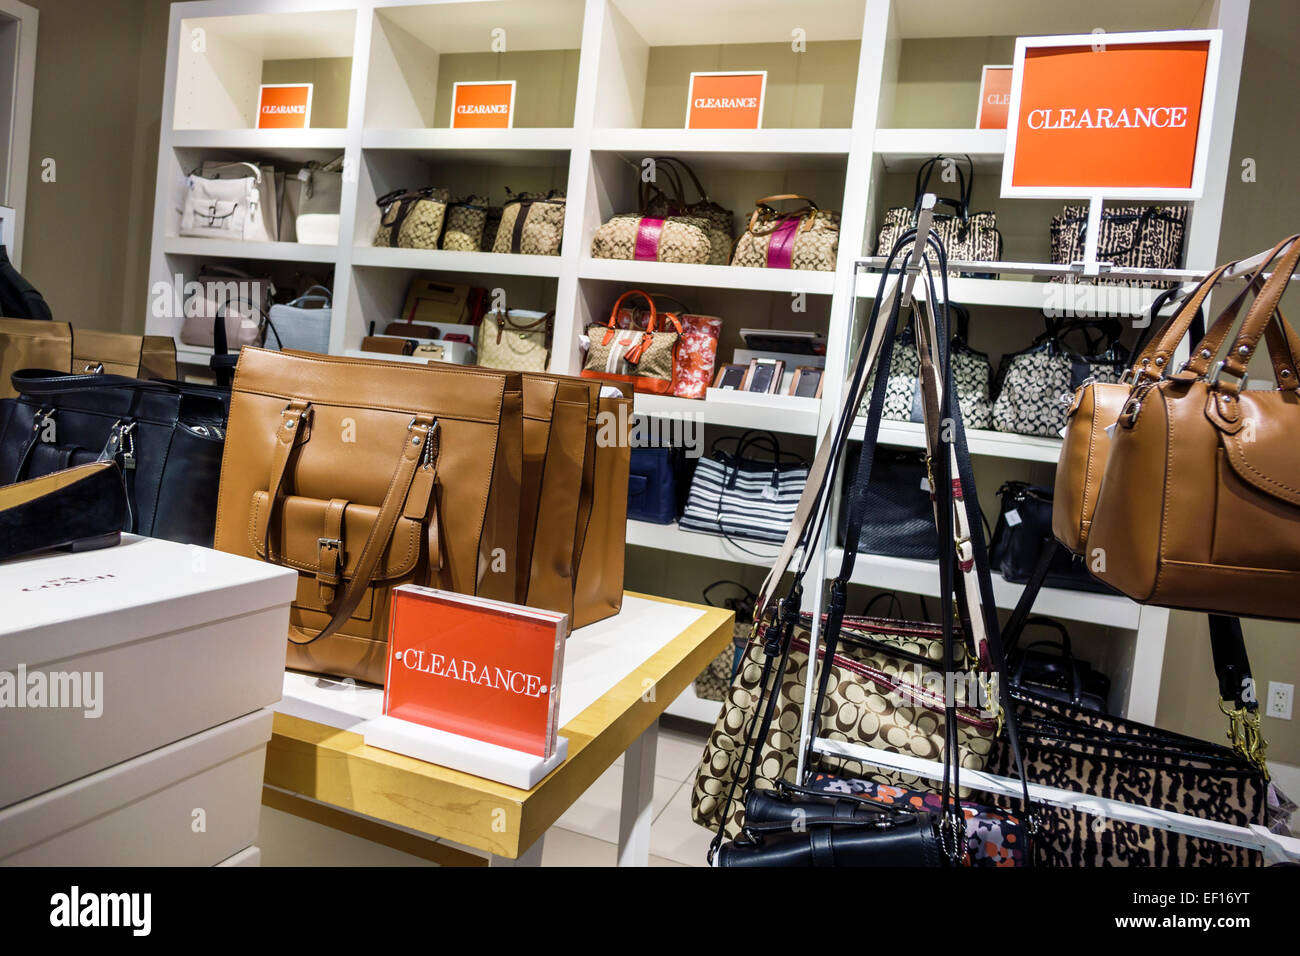 coach apparel outlet stui  Vero Beach Florida Vero Beach Outlets shopping Coach store inside women's  handbags sale display sign clearance